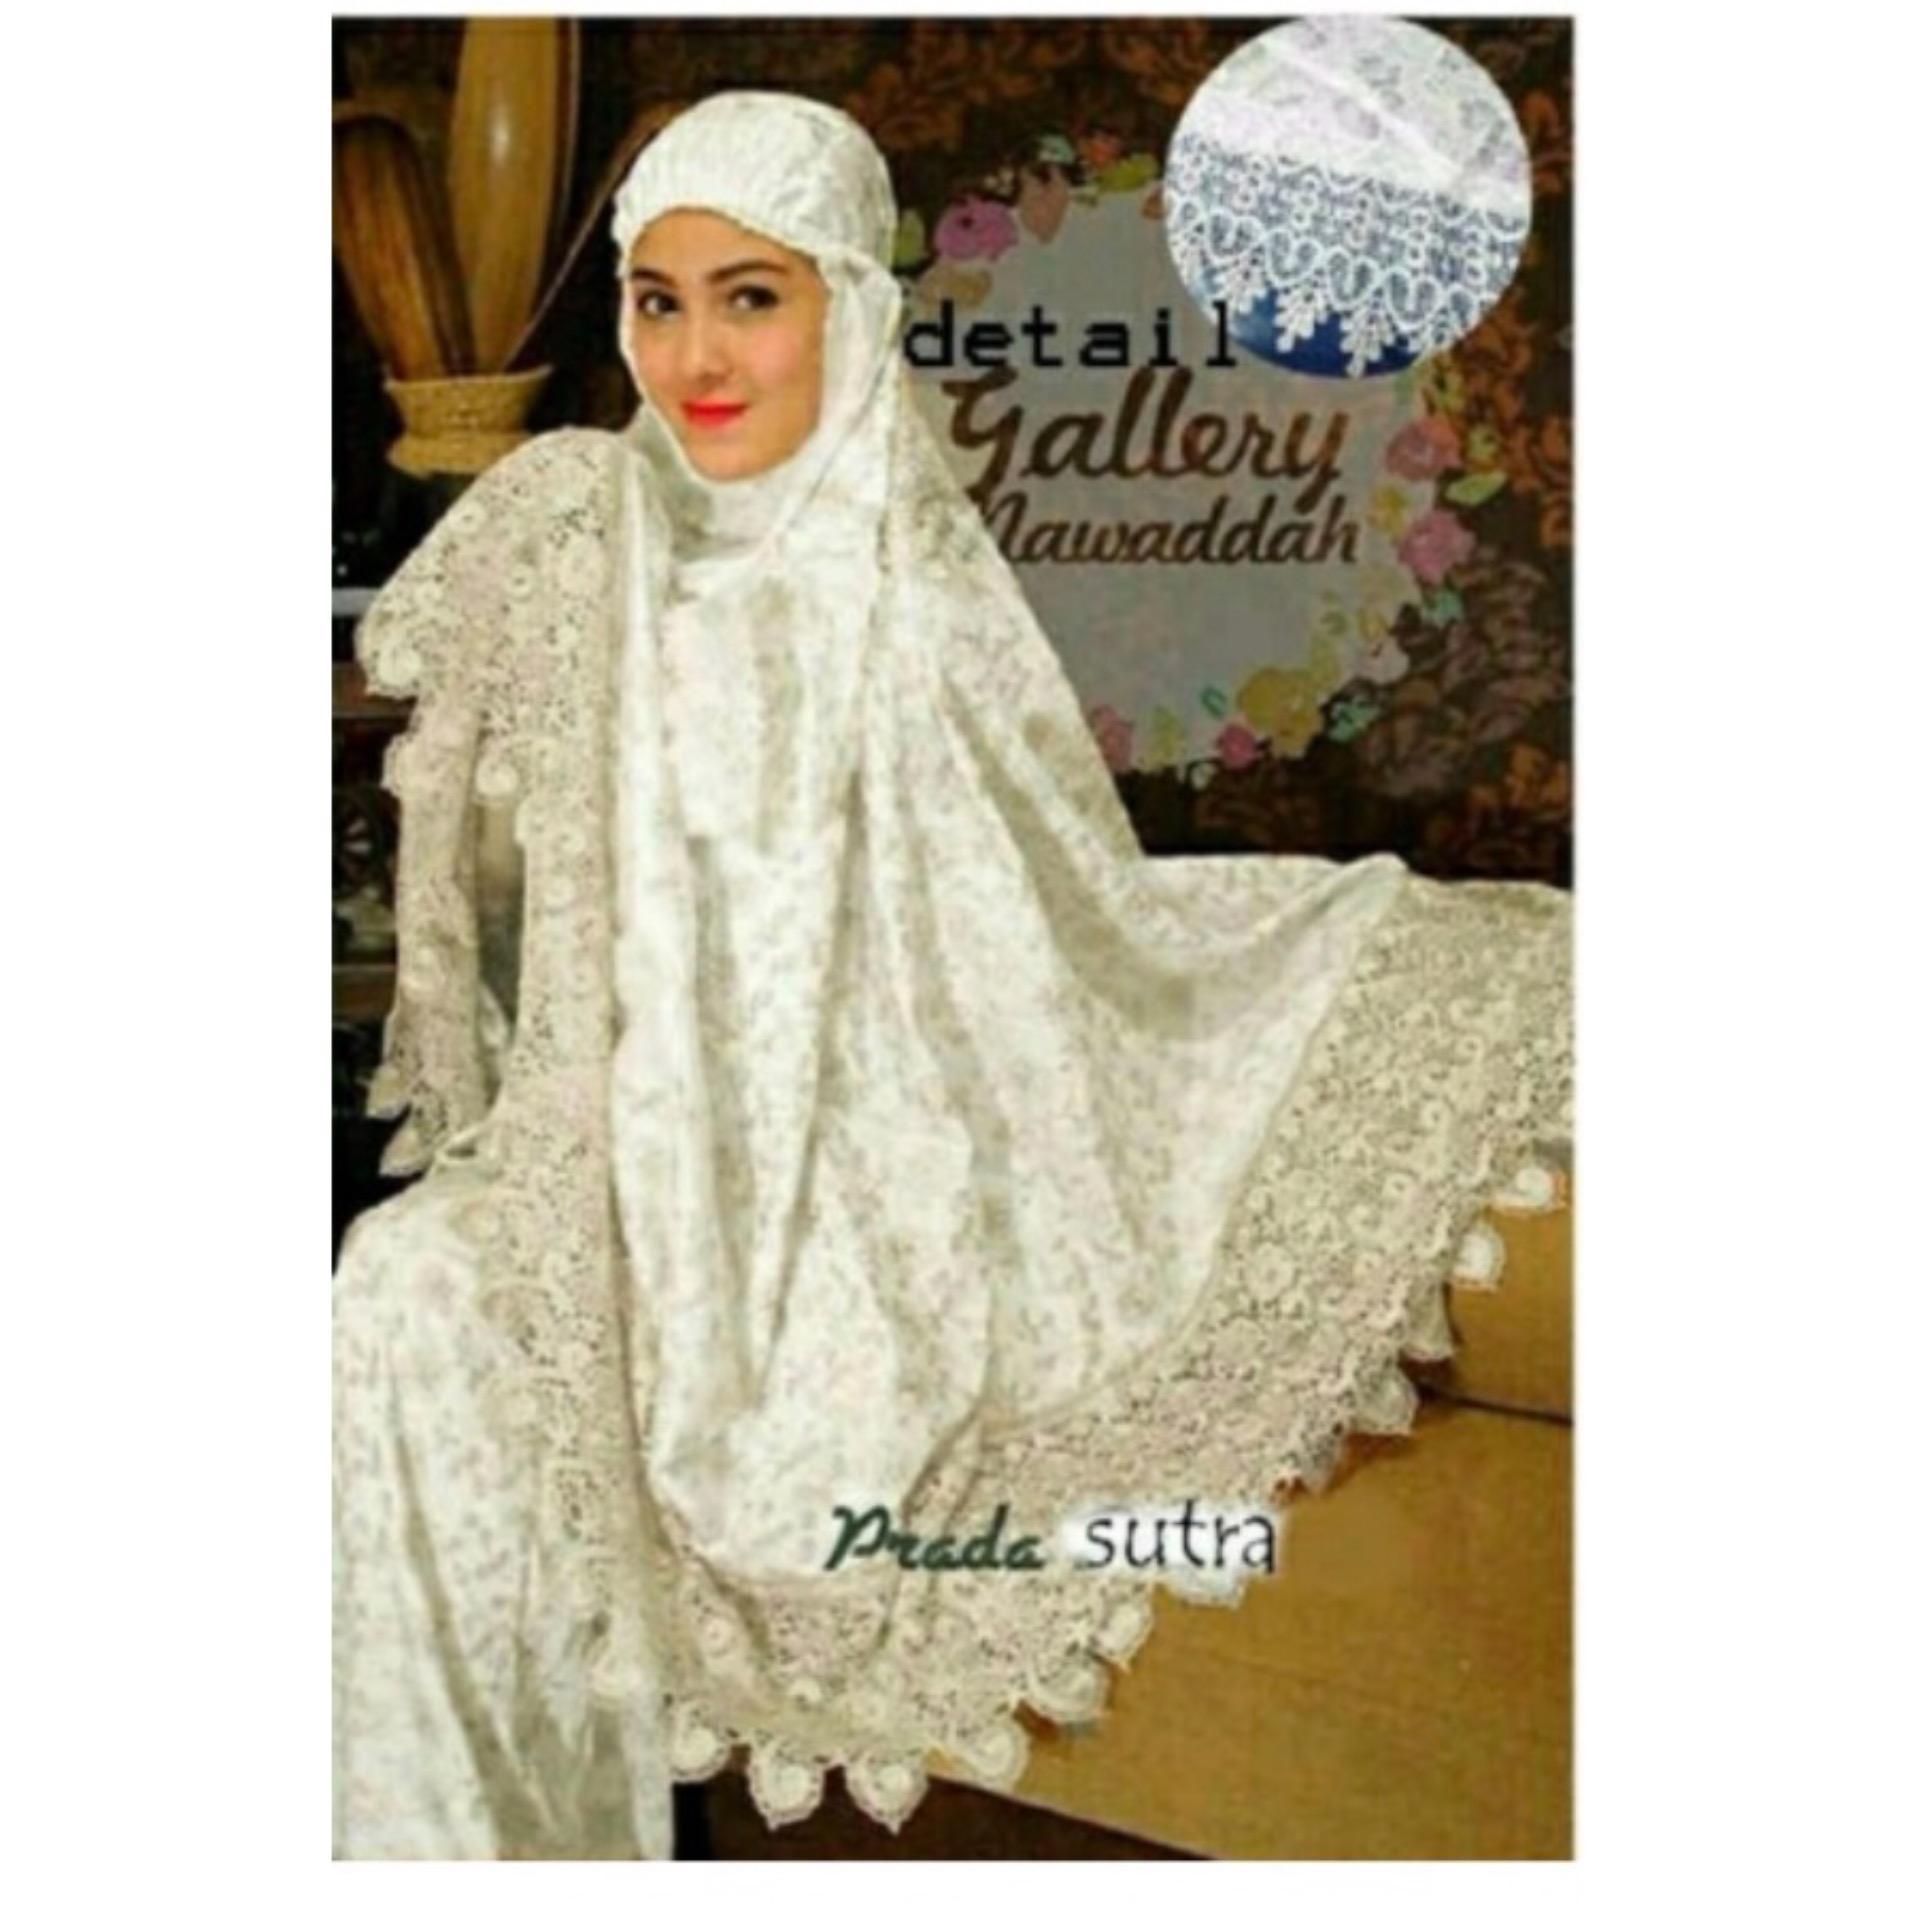 F Fashion Mukenah Wanita Muslim Sutera / Baju Gamis / Busana Muslim / Baju Muslim / Kebaya Modern / Hijab Muslim / Gamis Muslim / Bergo / Syari / Hijab Wanita / Maxi Hijab